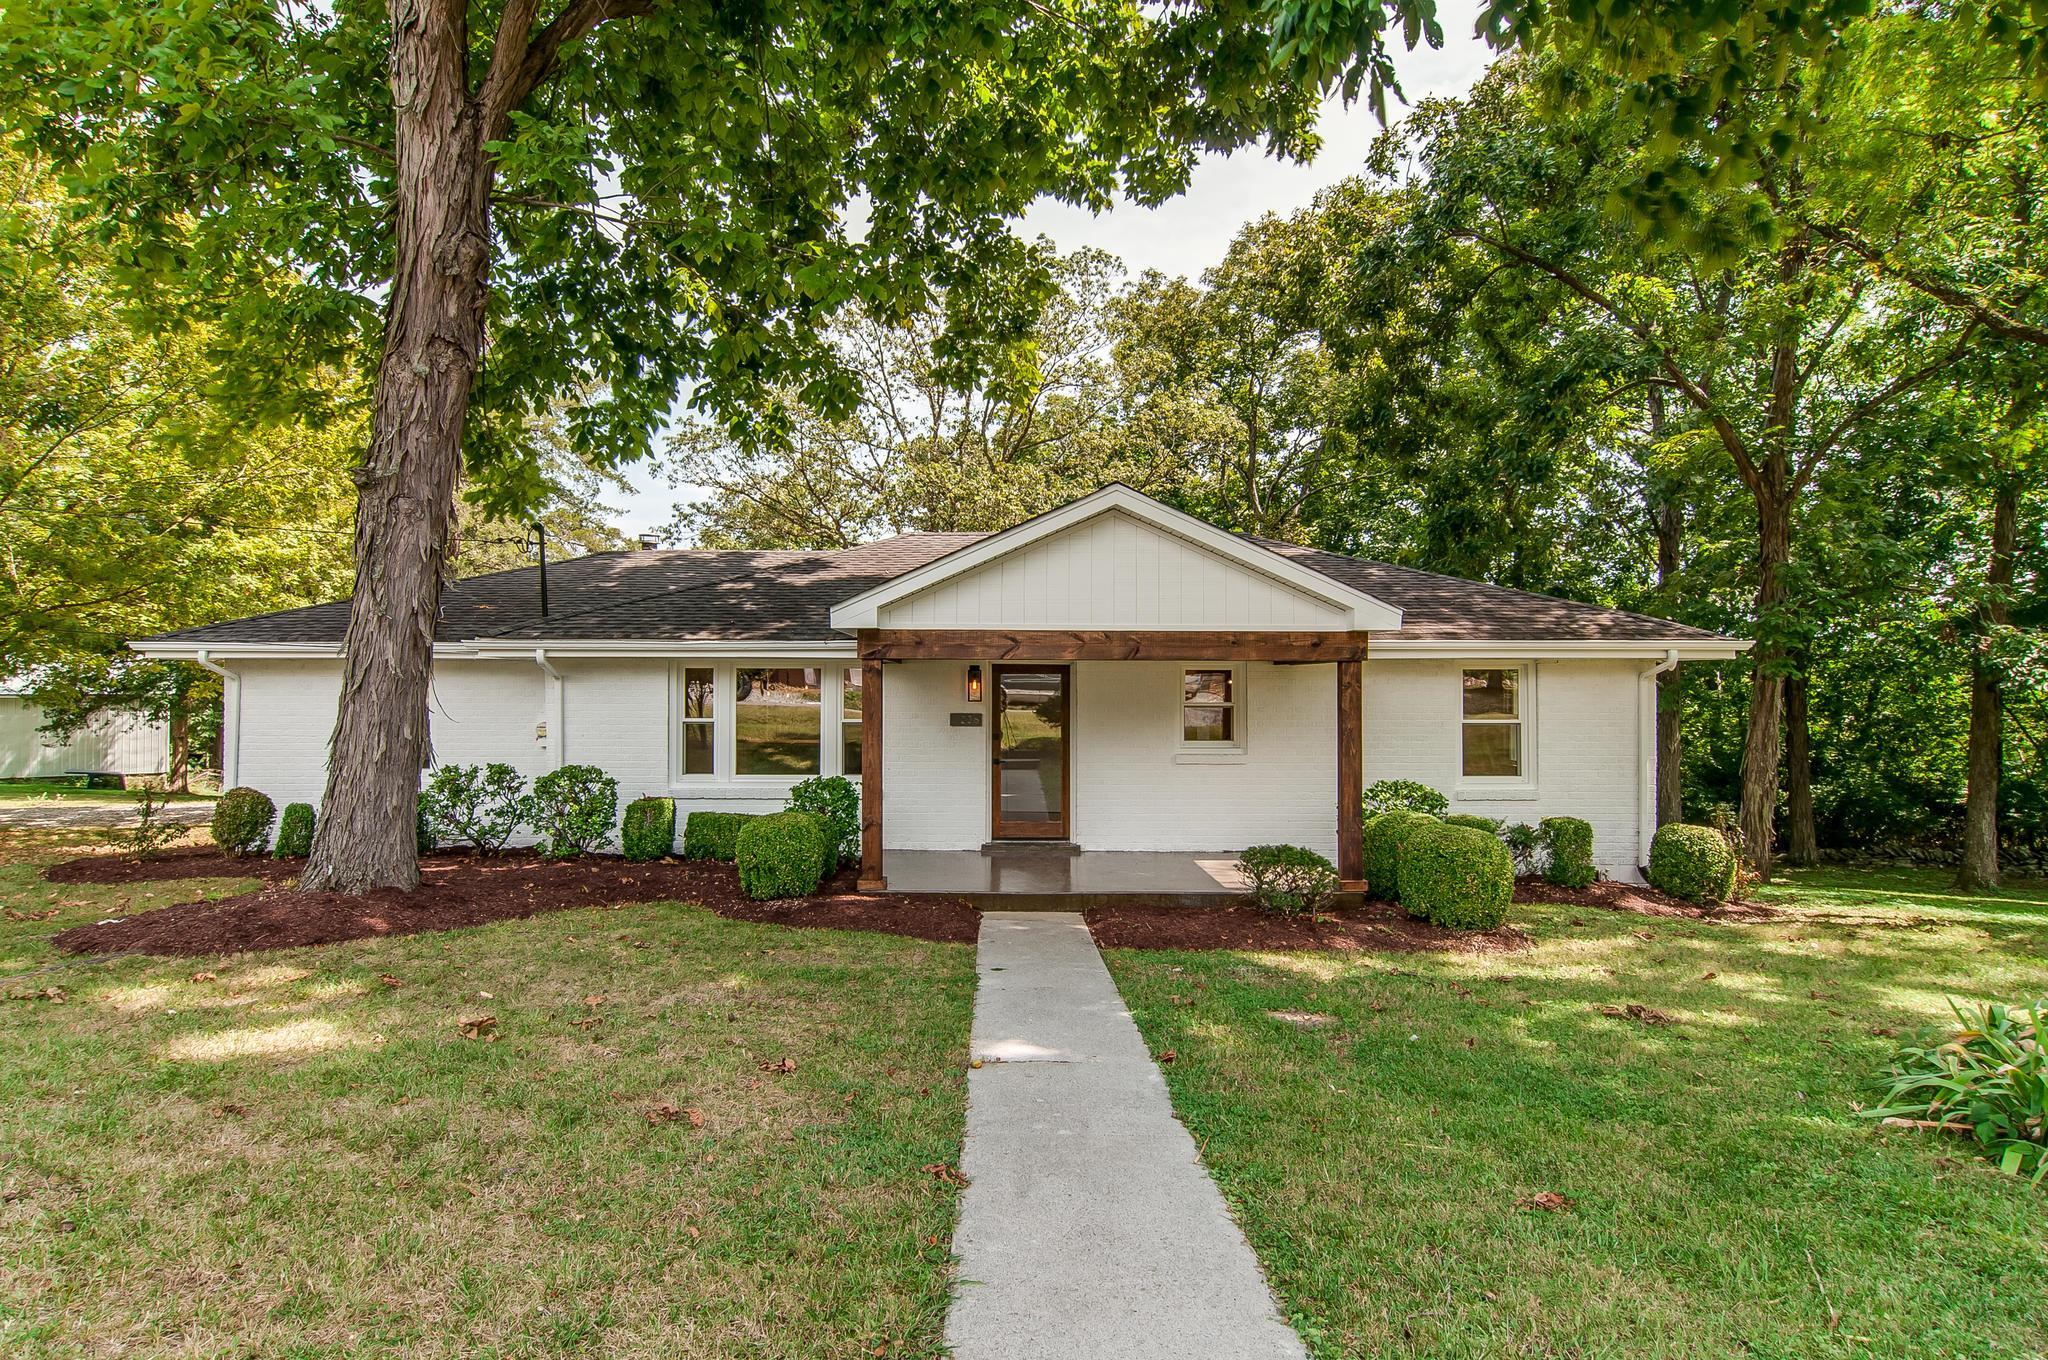 236 Liberty Ln, Madison, TN 37115 - Madison, TN real estate listing